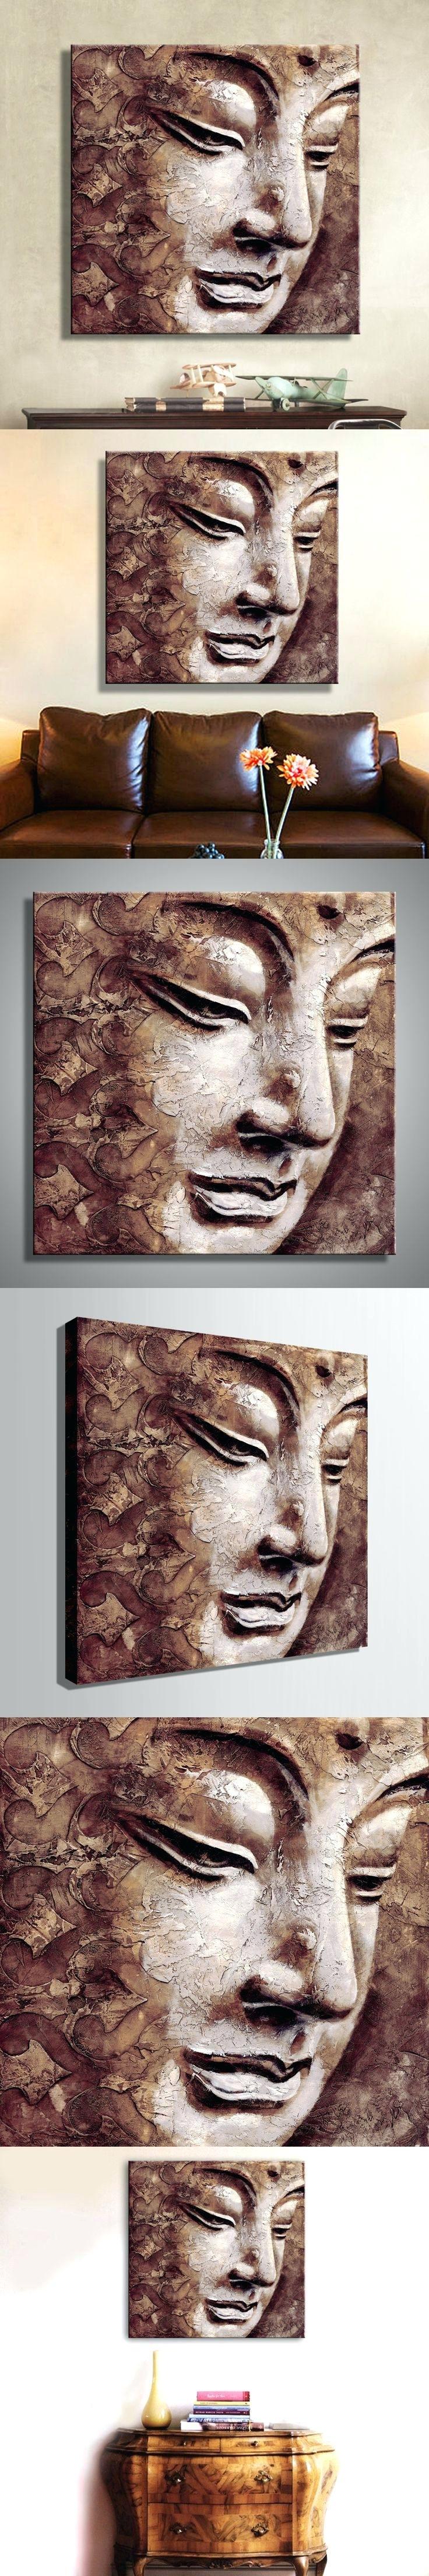 Wall Arts ~ Large Buddha Face Wall Art Large Buddha Wall Art Large Throughout Most Popular Abstract Buddha Wall Art (View 11 of 20)